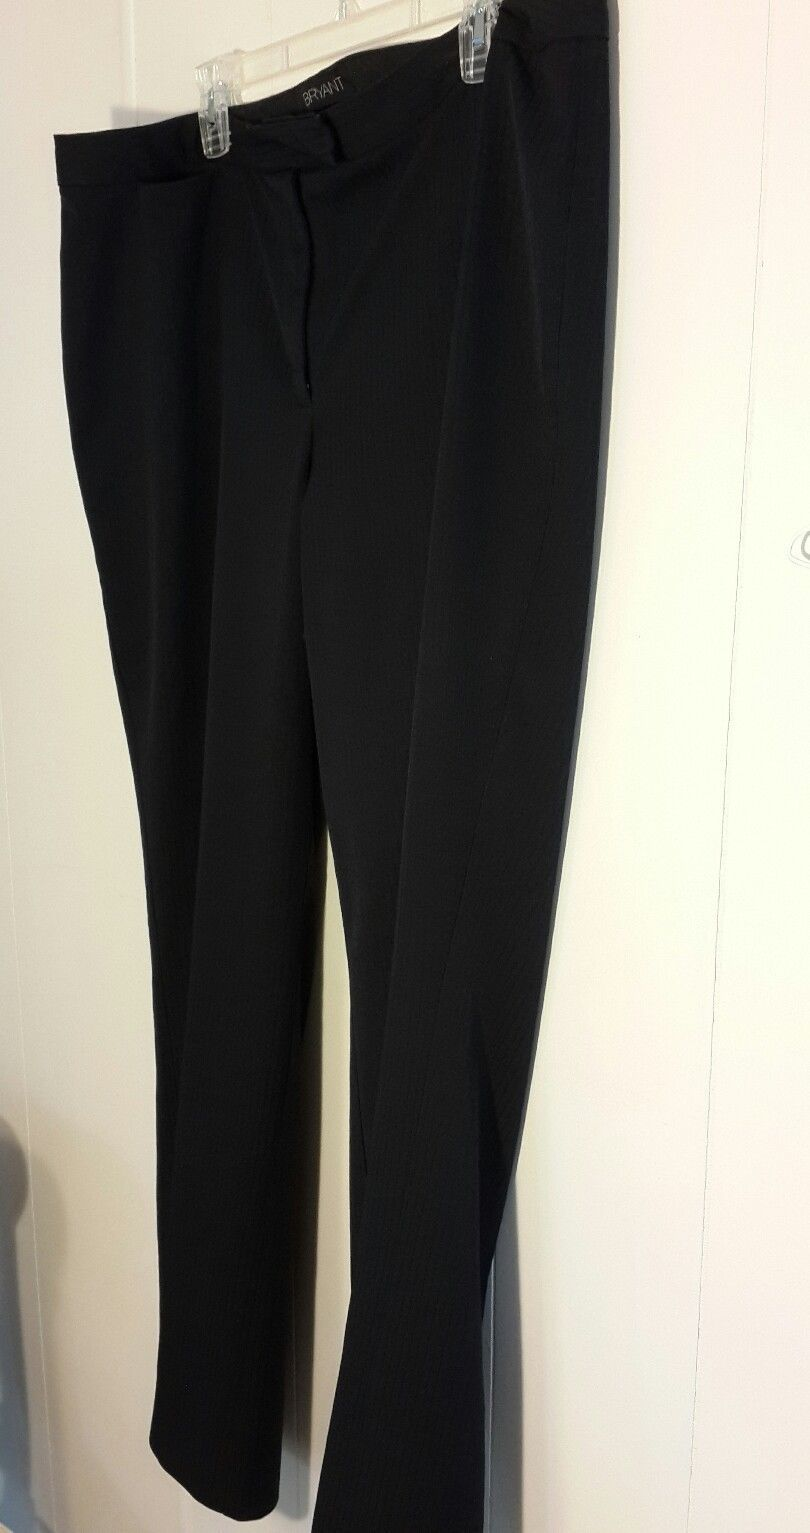 fb6c8d9dc22 Lane Bryant Dress Pants sz 18 Textured and similar items. S l1600